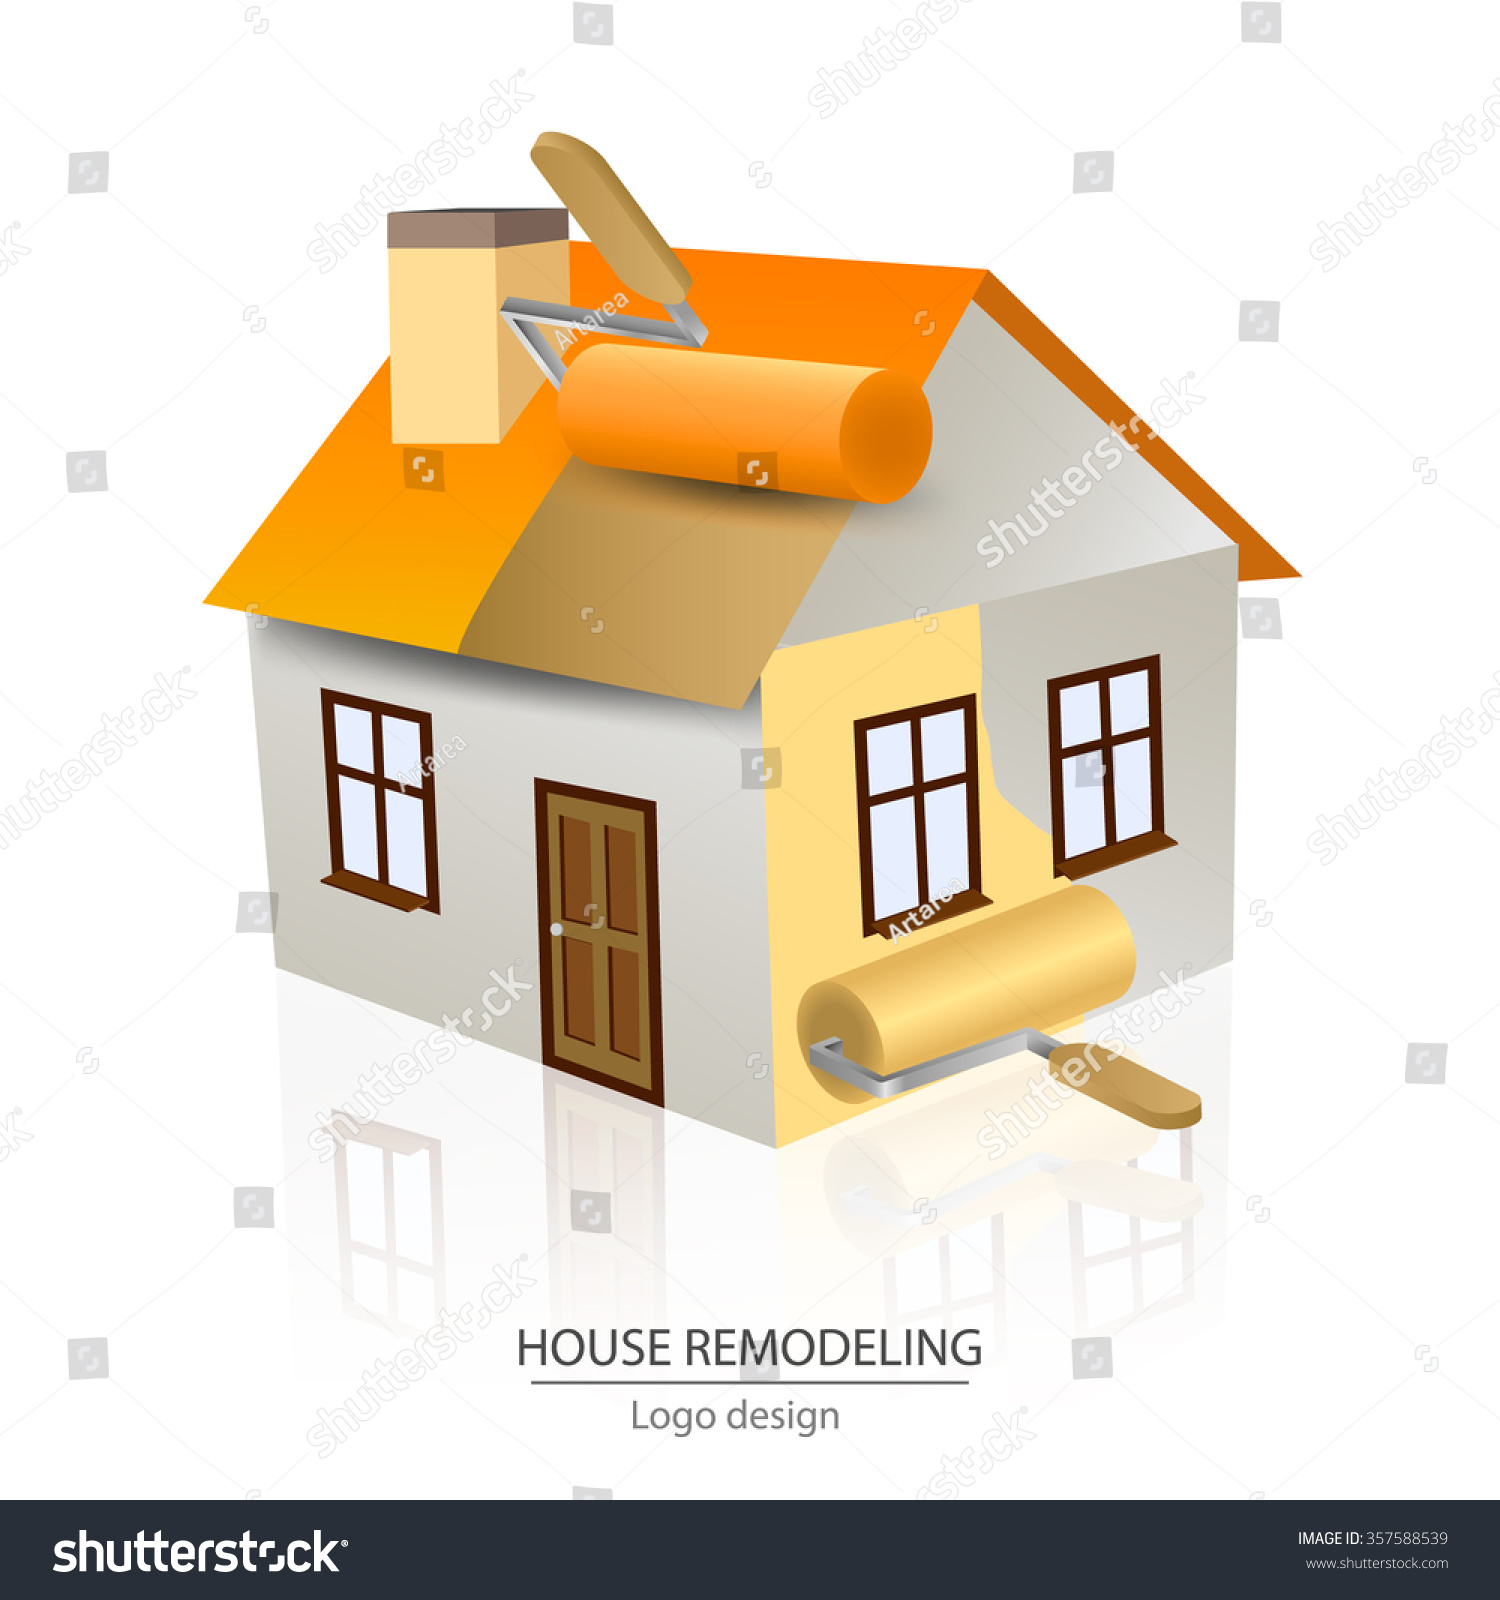 house remodeling logo design paint roller stock vector homepro home remodeling group logo design 48hourslogo com